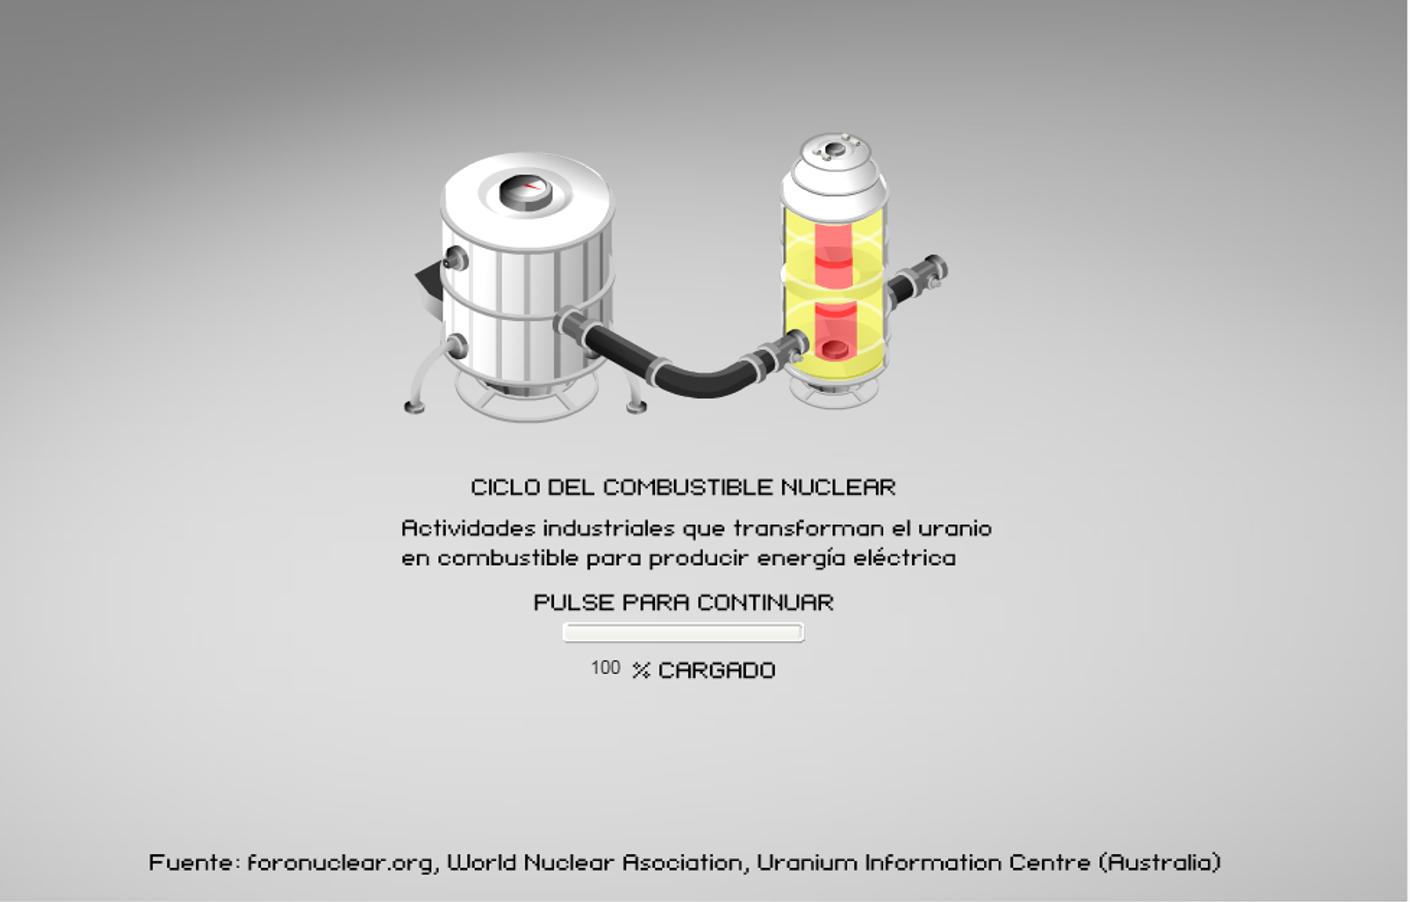 CICLO DEL COMBUSTIBLE NUCLEAR